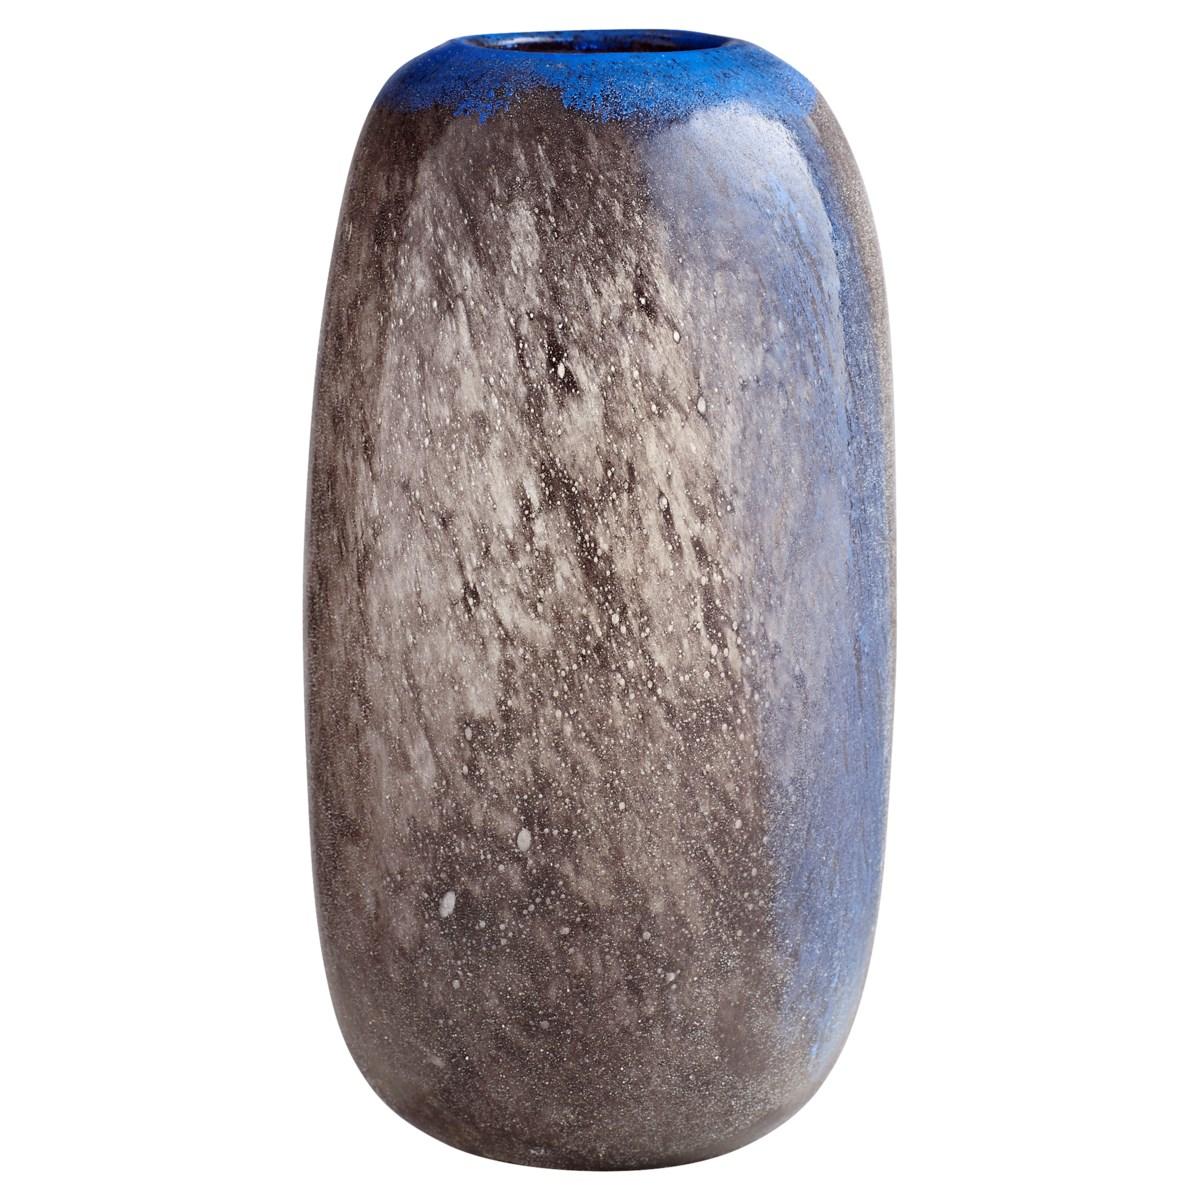 Small Bluesposion Vase